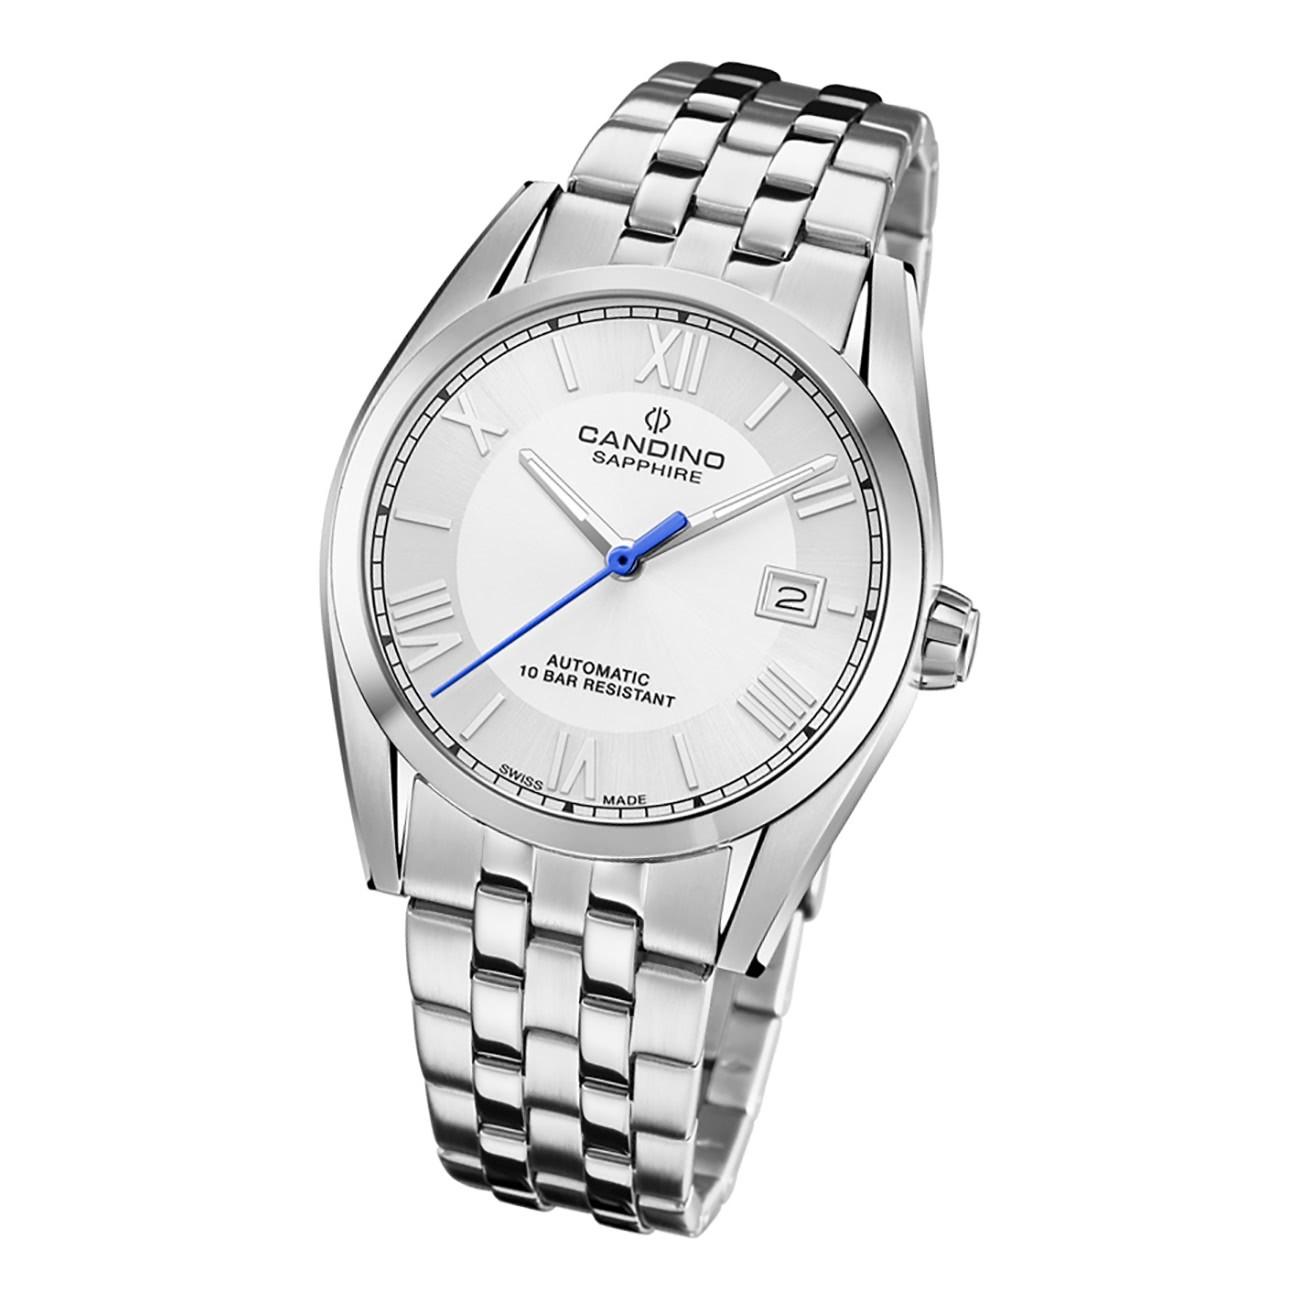 Candino Herren Armbanduhr Automatik C4701/1 Analog Edelstahl silber UC4701/1